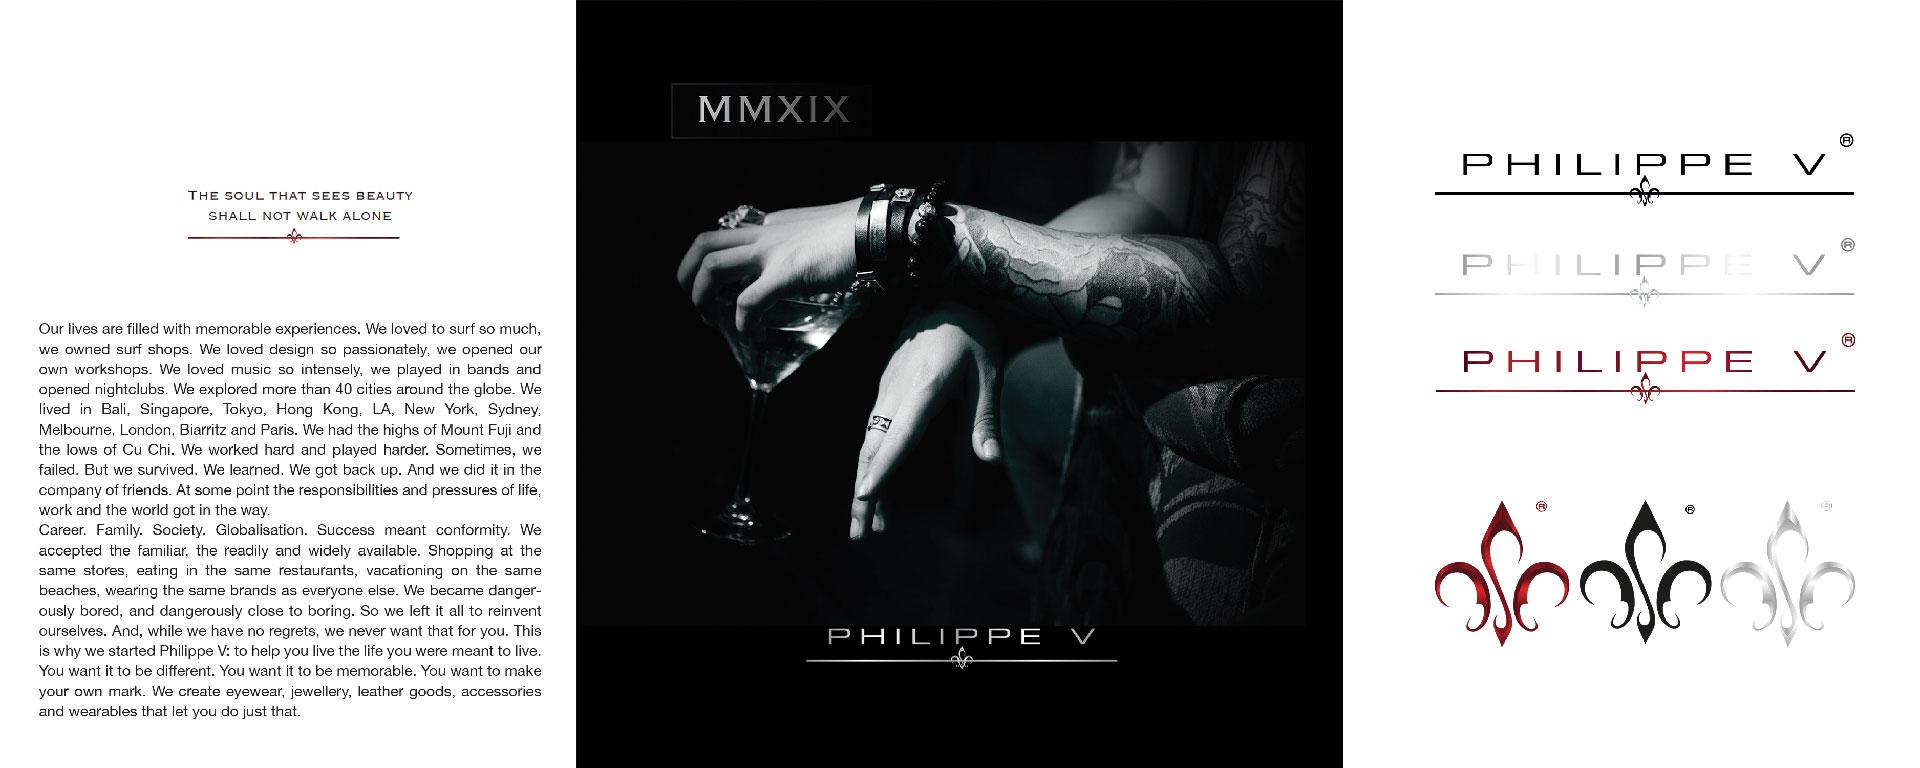 Philippe-V